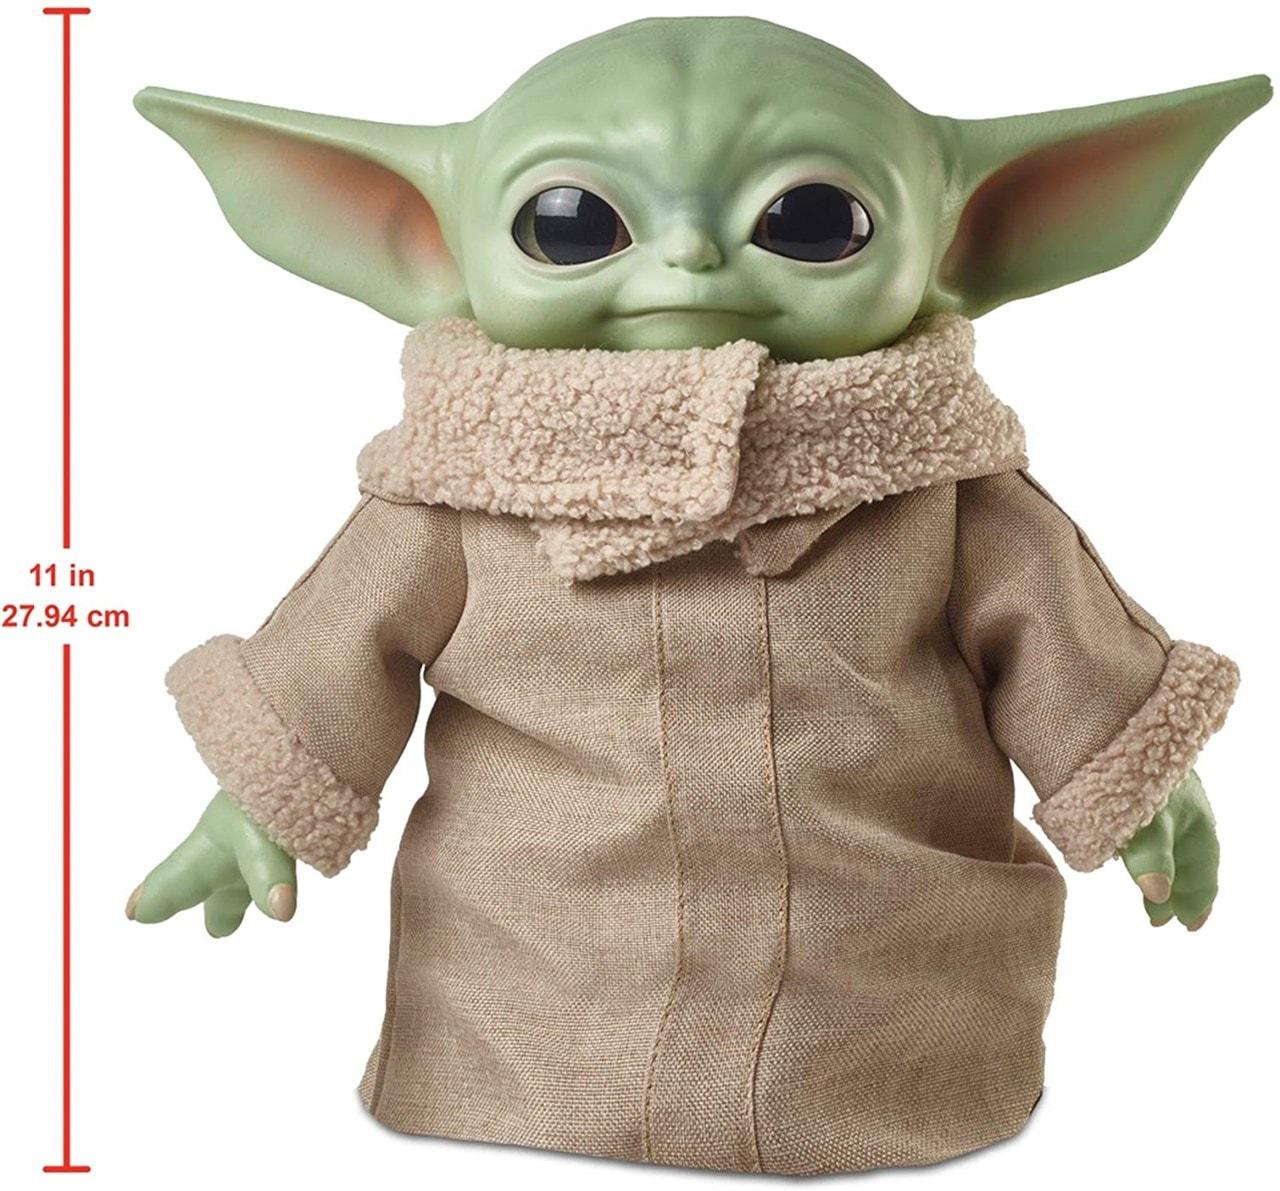 "The Mandalorian: The Child (Baby Yoda) 11"" Star Wars Plush - 2"